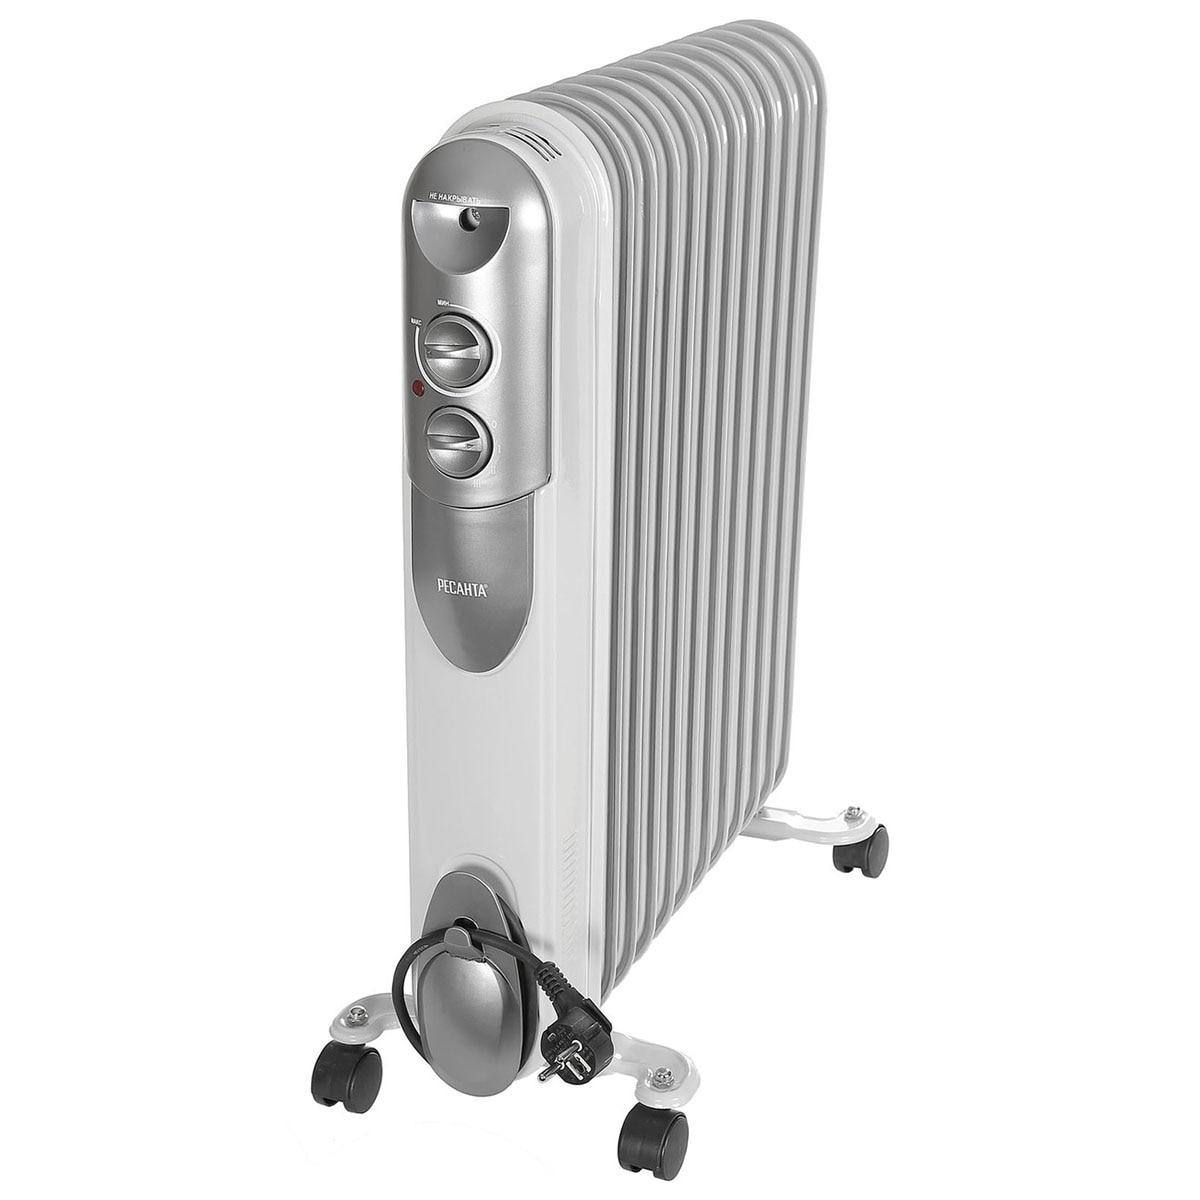 Oil radiator Resanta OMPT-12H